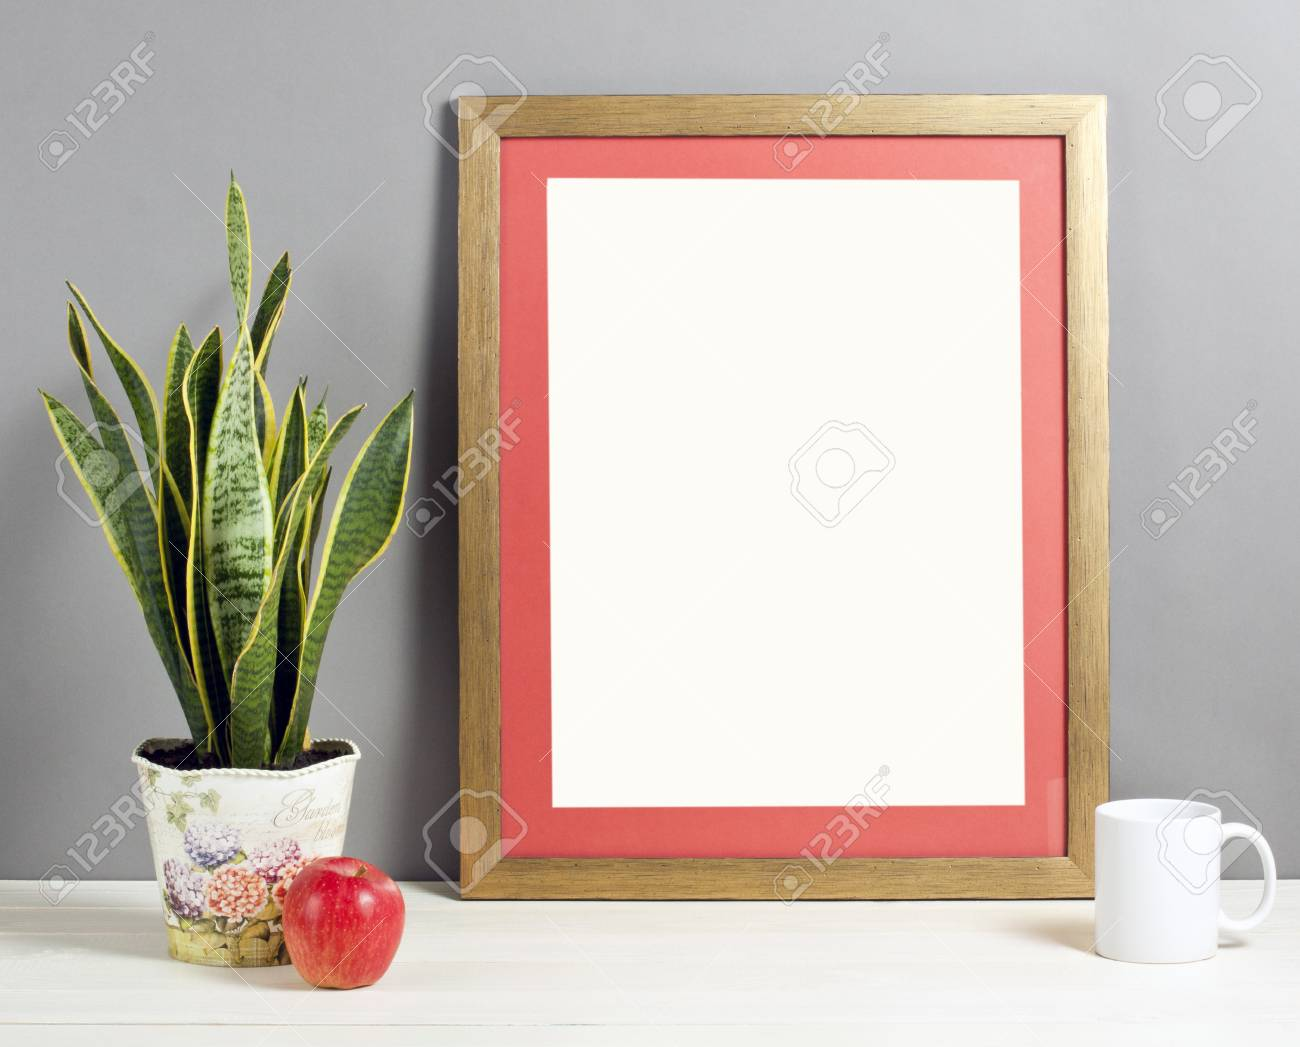 Brown Frame Mockup With Plant Pot, Mug And Apple On Wooden Shelf ...